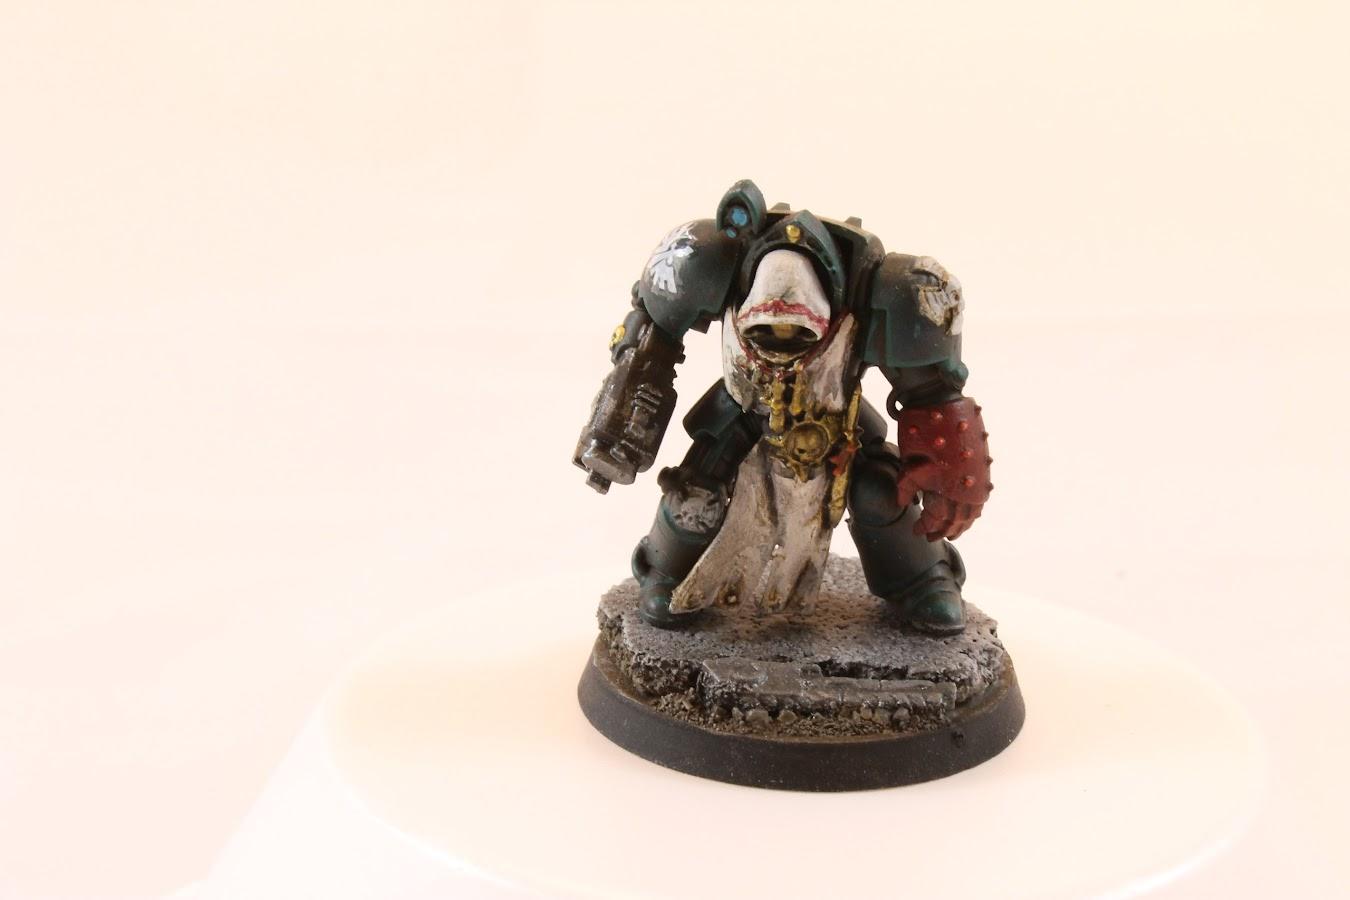 Terminator #3, painted